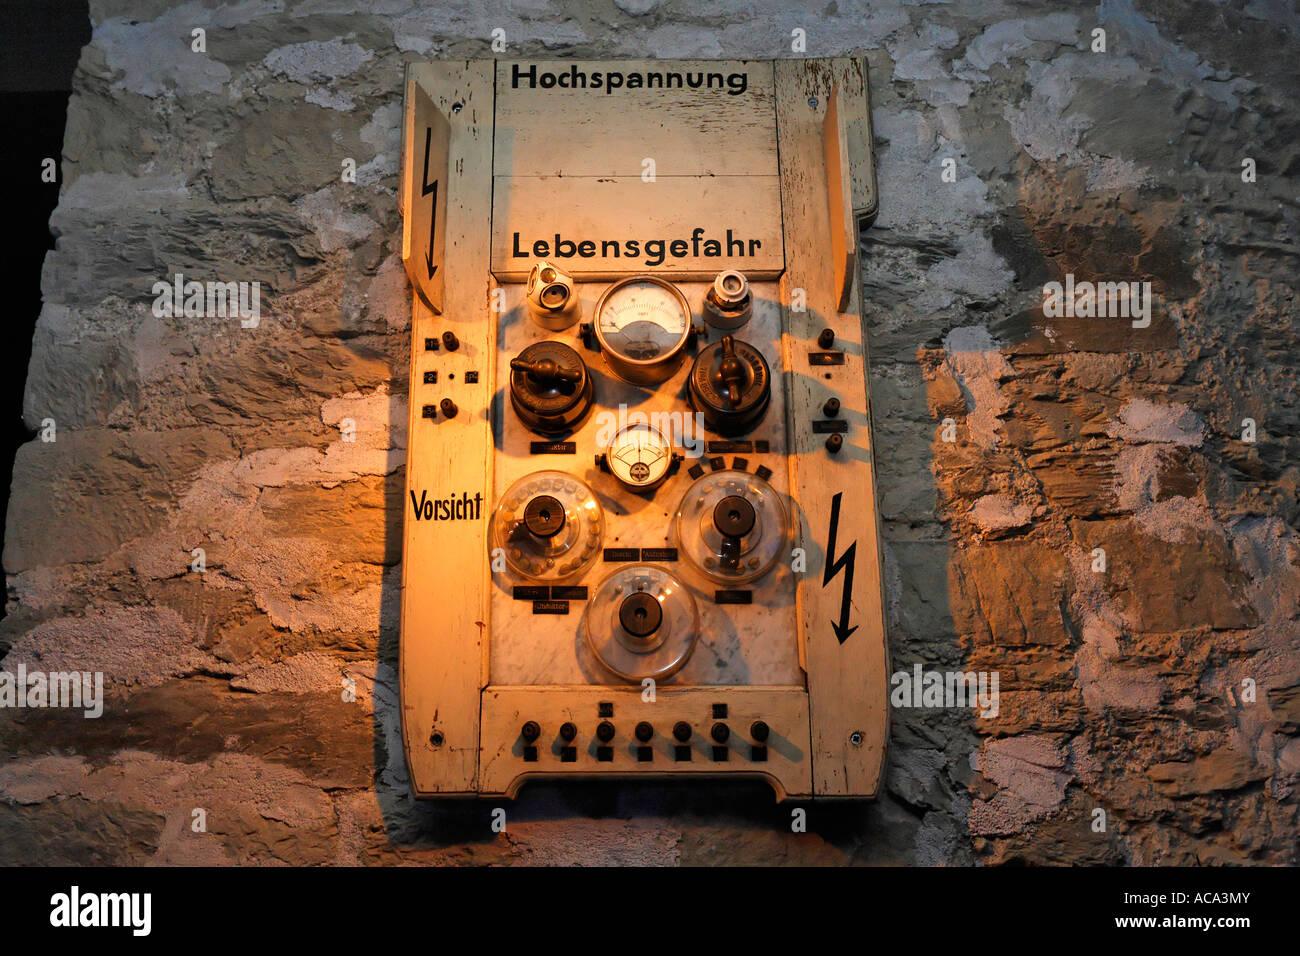 hight resolution of historic fuse box roentgen cabinet from 1905 exhibit at german roentgen museum remscheid